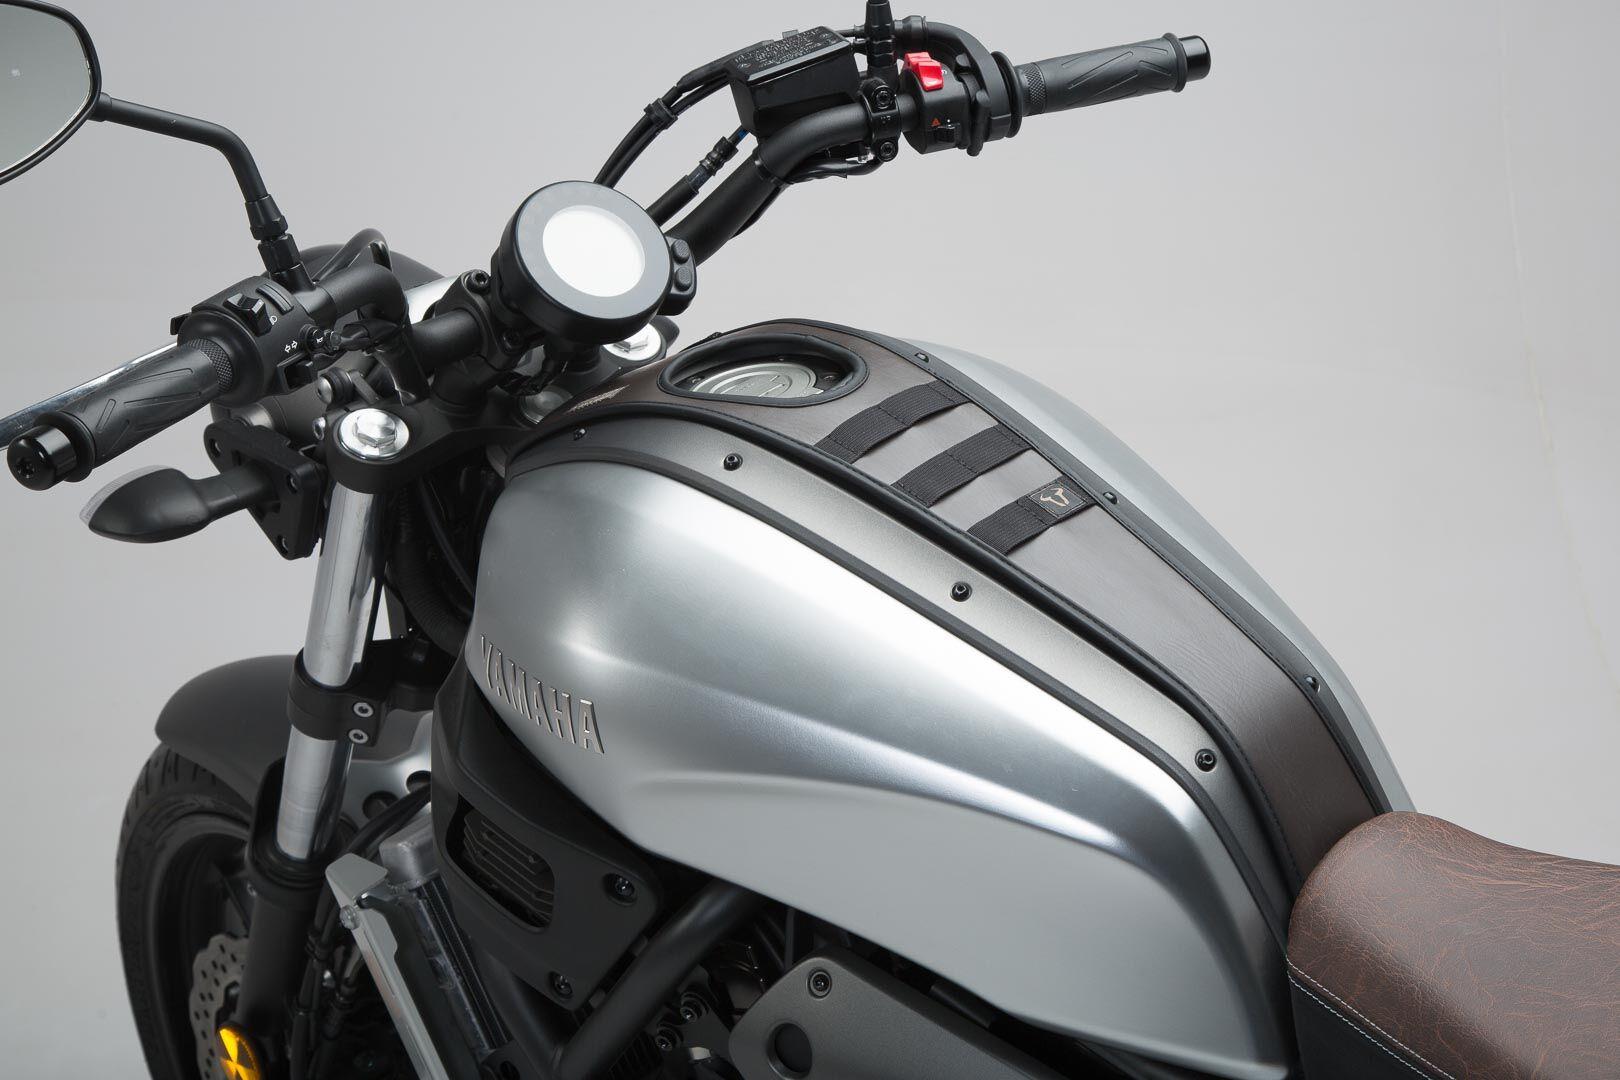 SW-Motech Legend Gear correa para depósito SLA - Yamaha XSR 700 (16-).